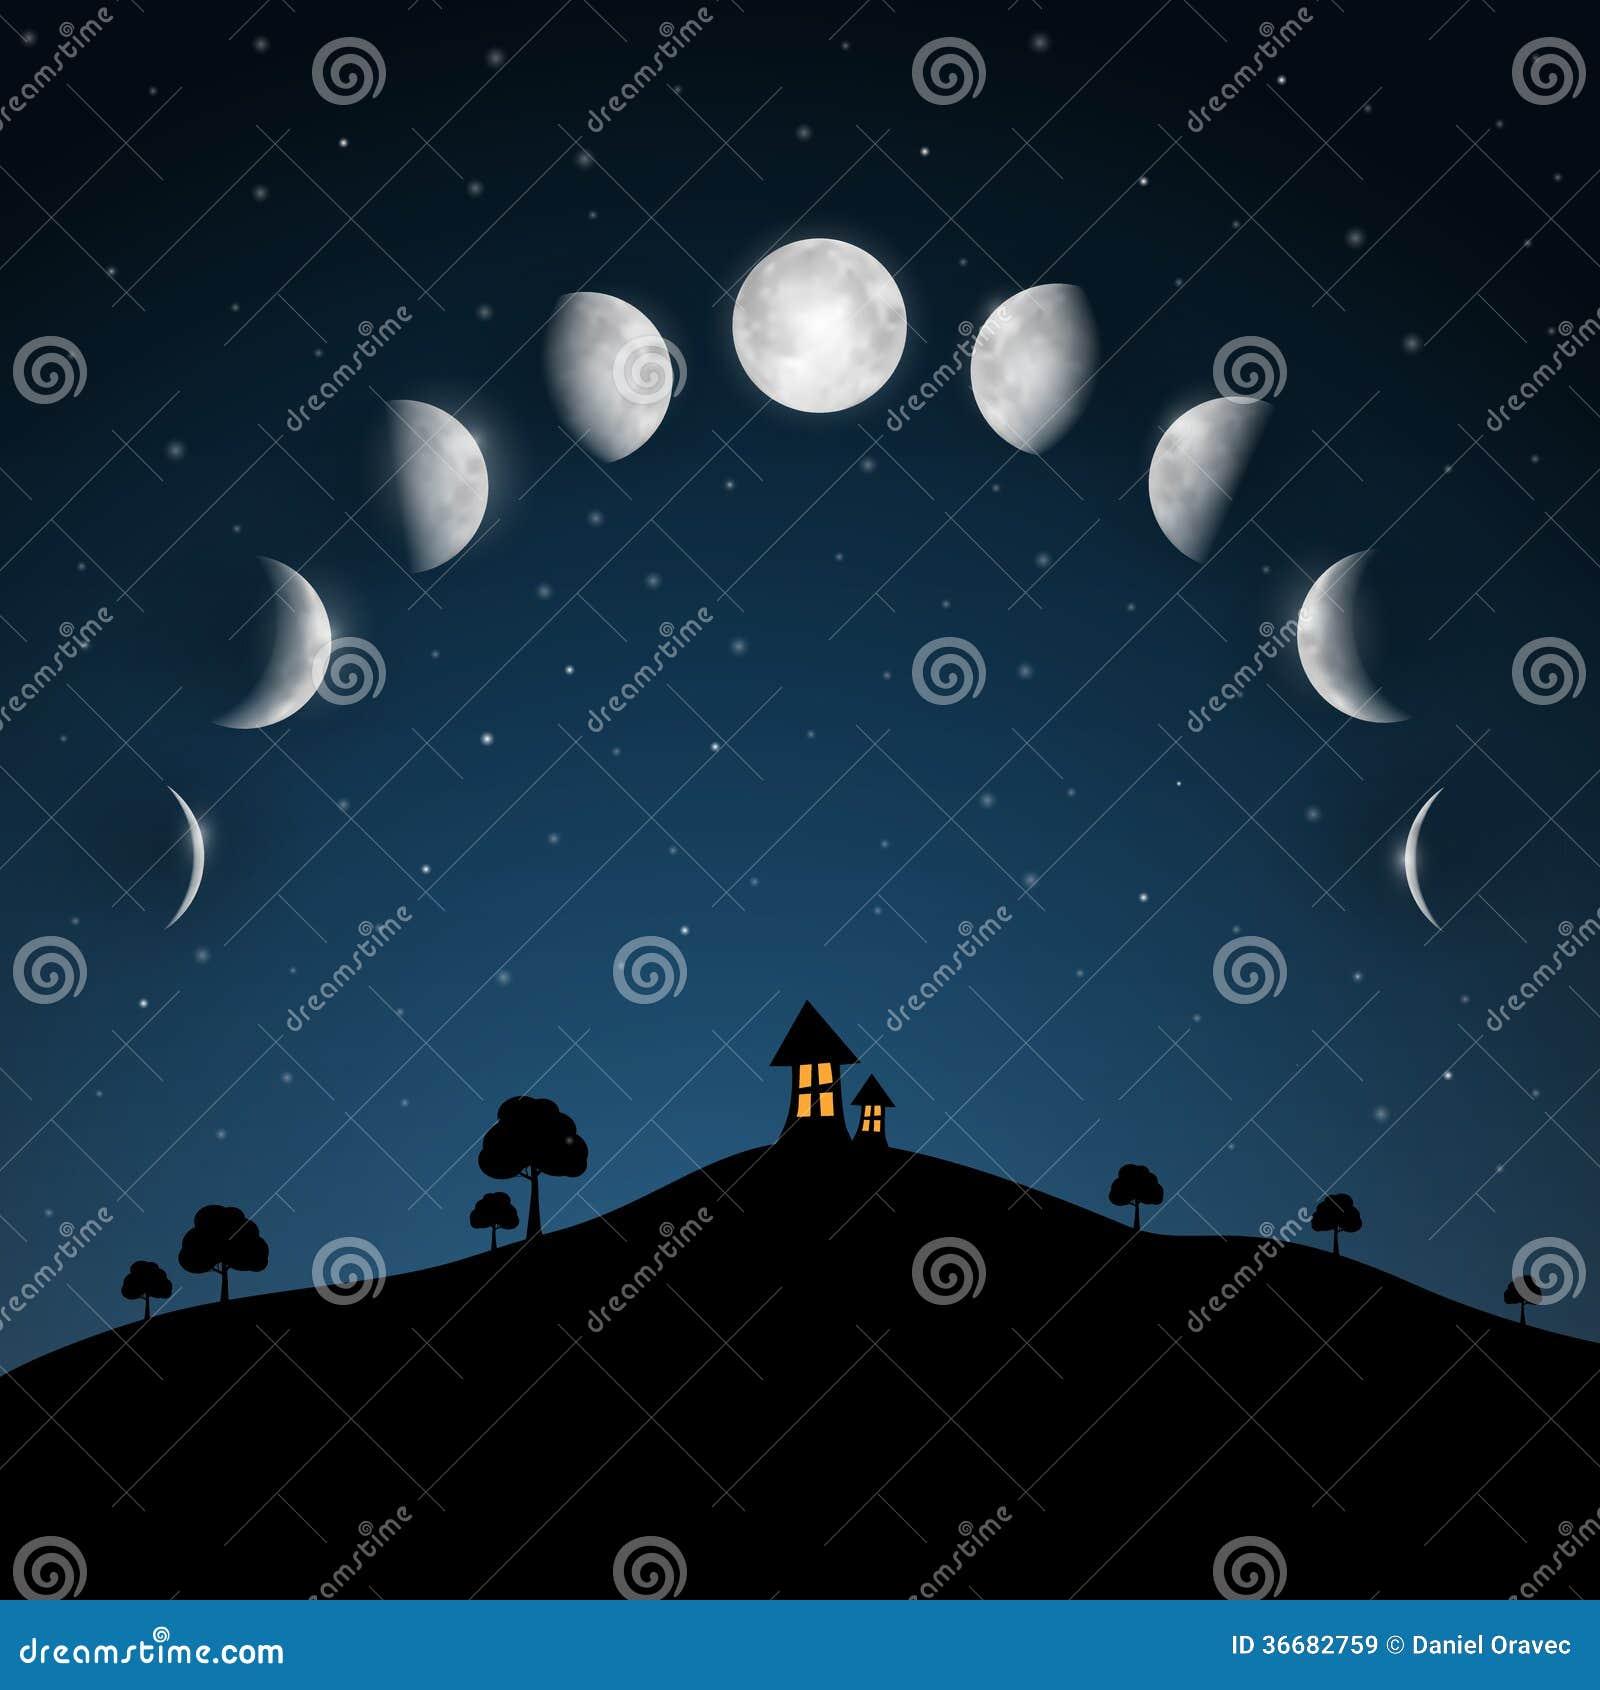 Fases de la luna. Paisaje de la noche.